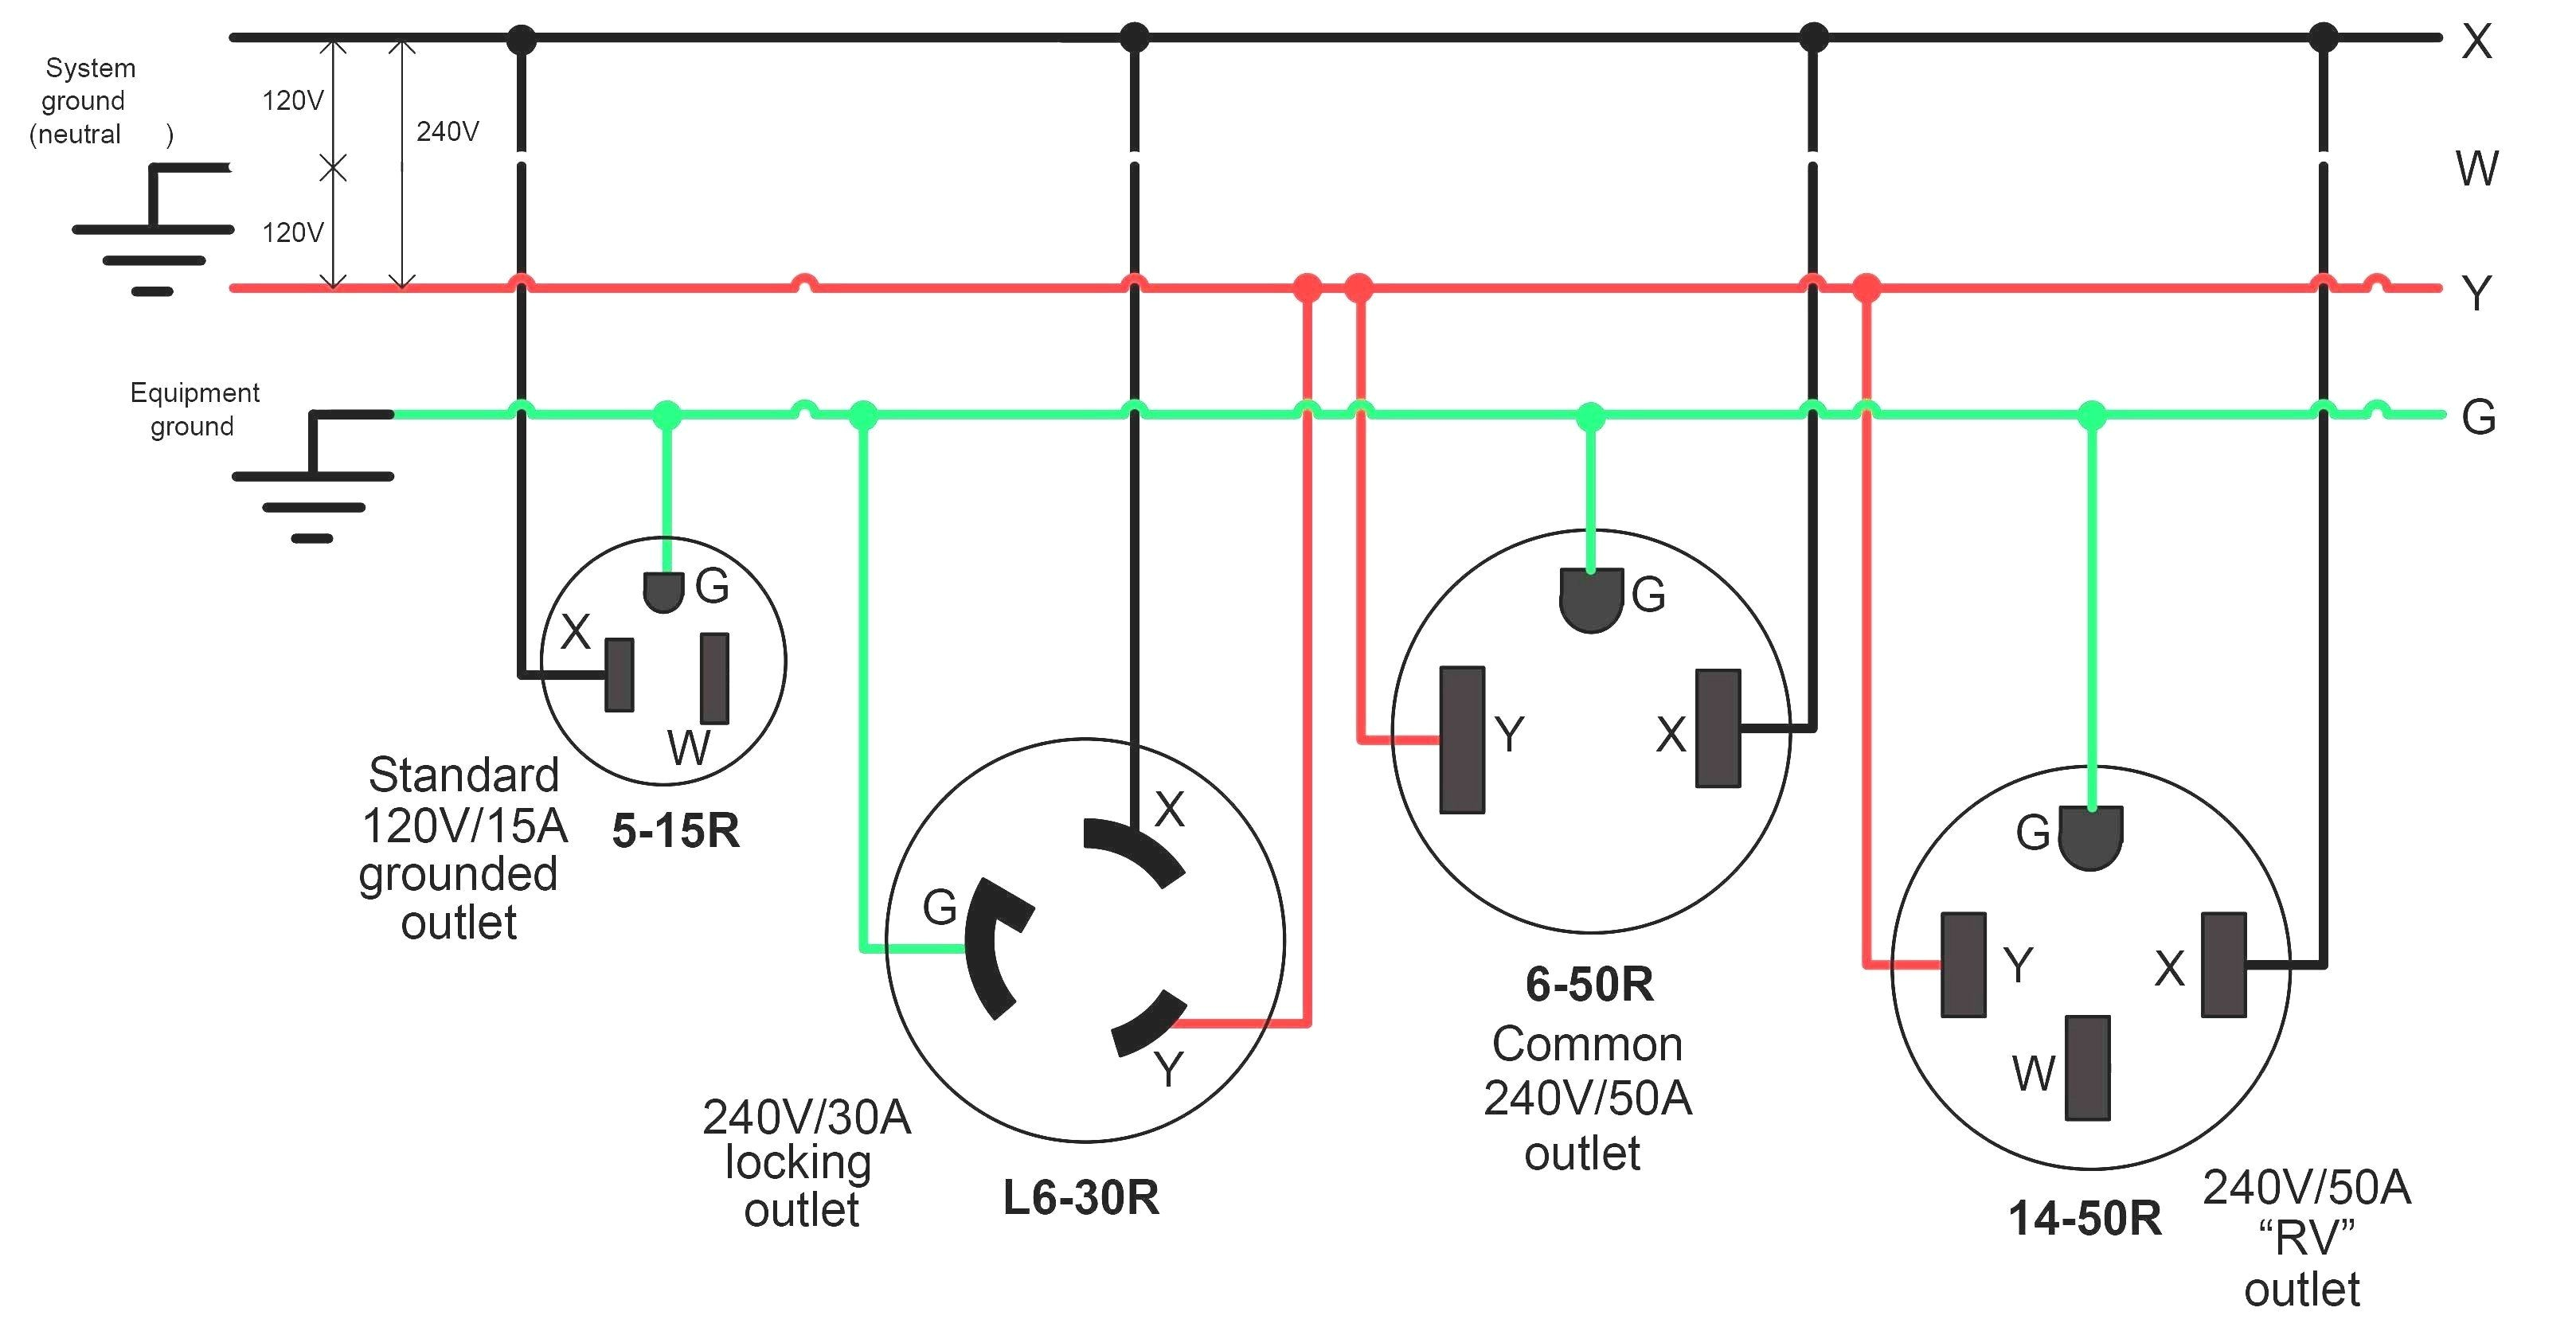 nema 5 20r diagram wiring diagram operations nema 5 20 diagram nema 5 20r diagram